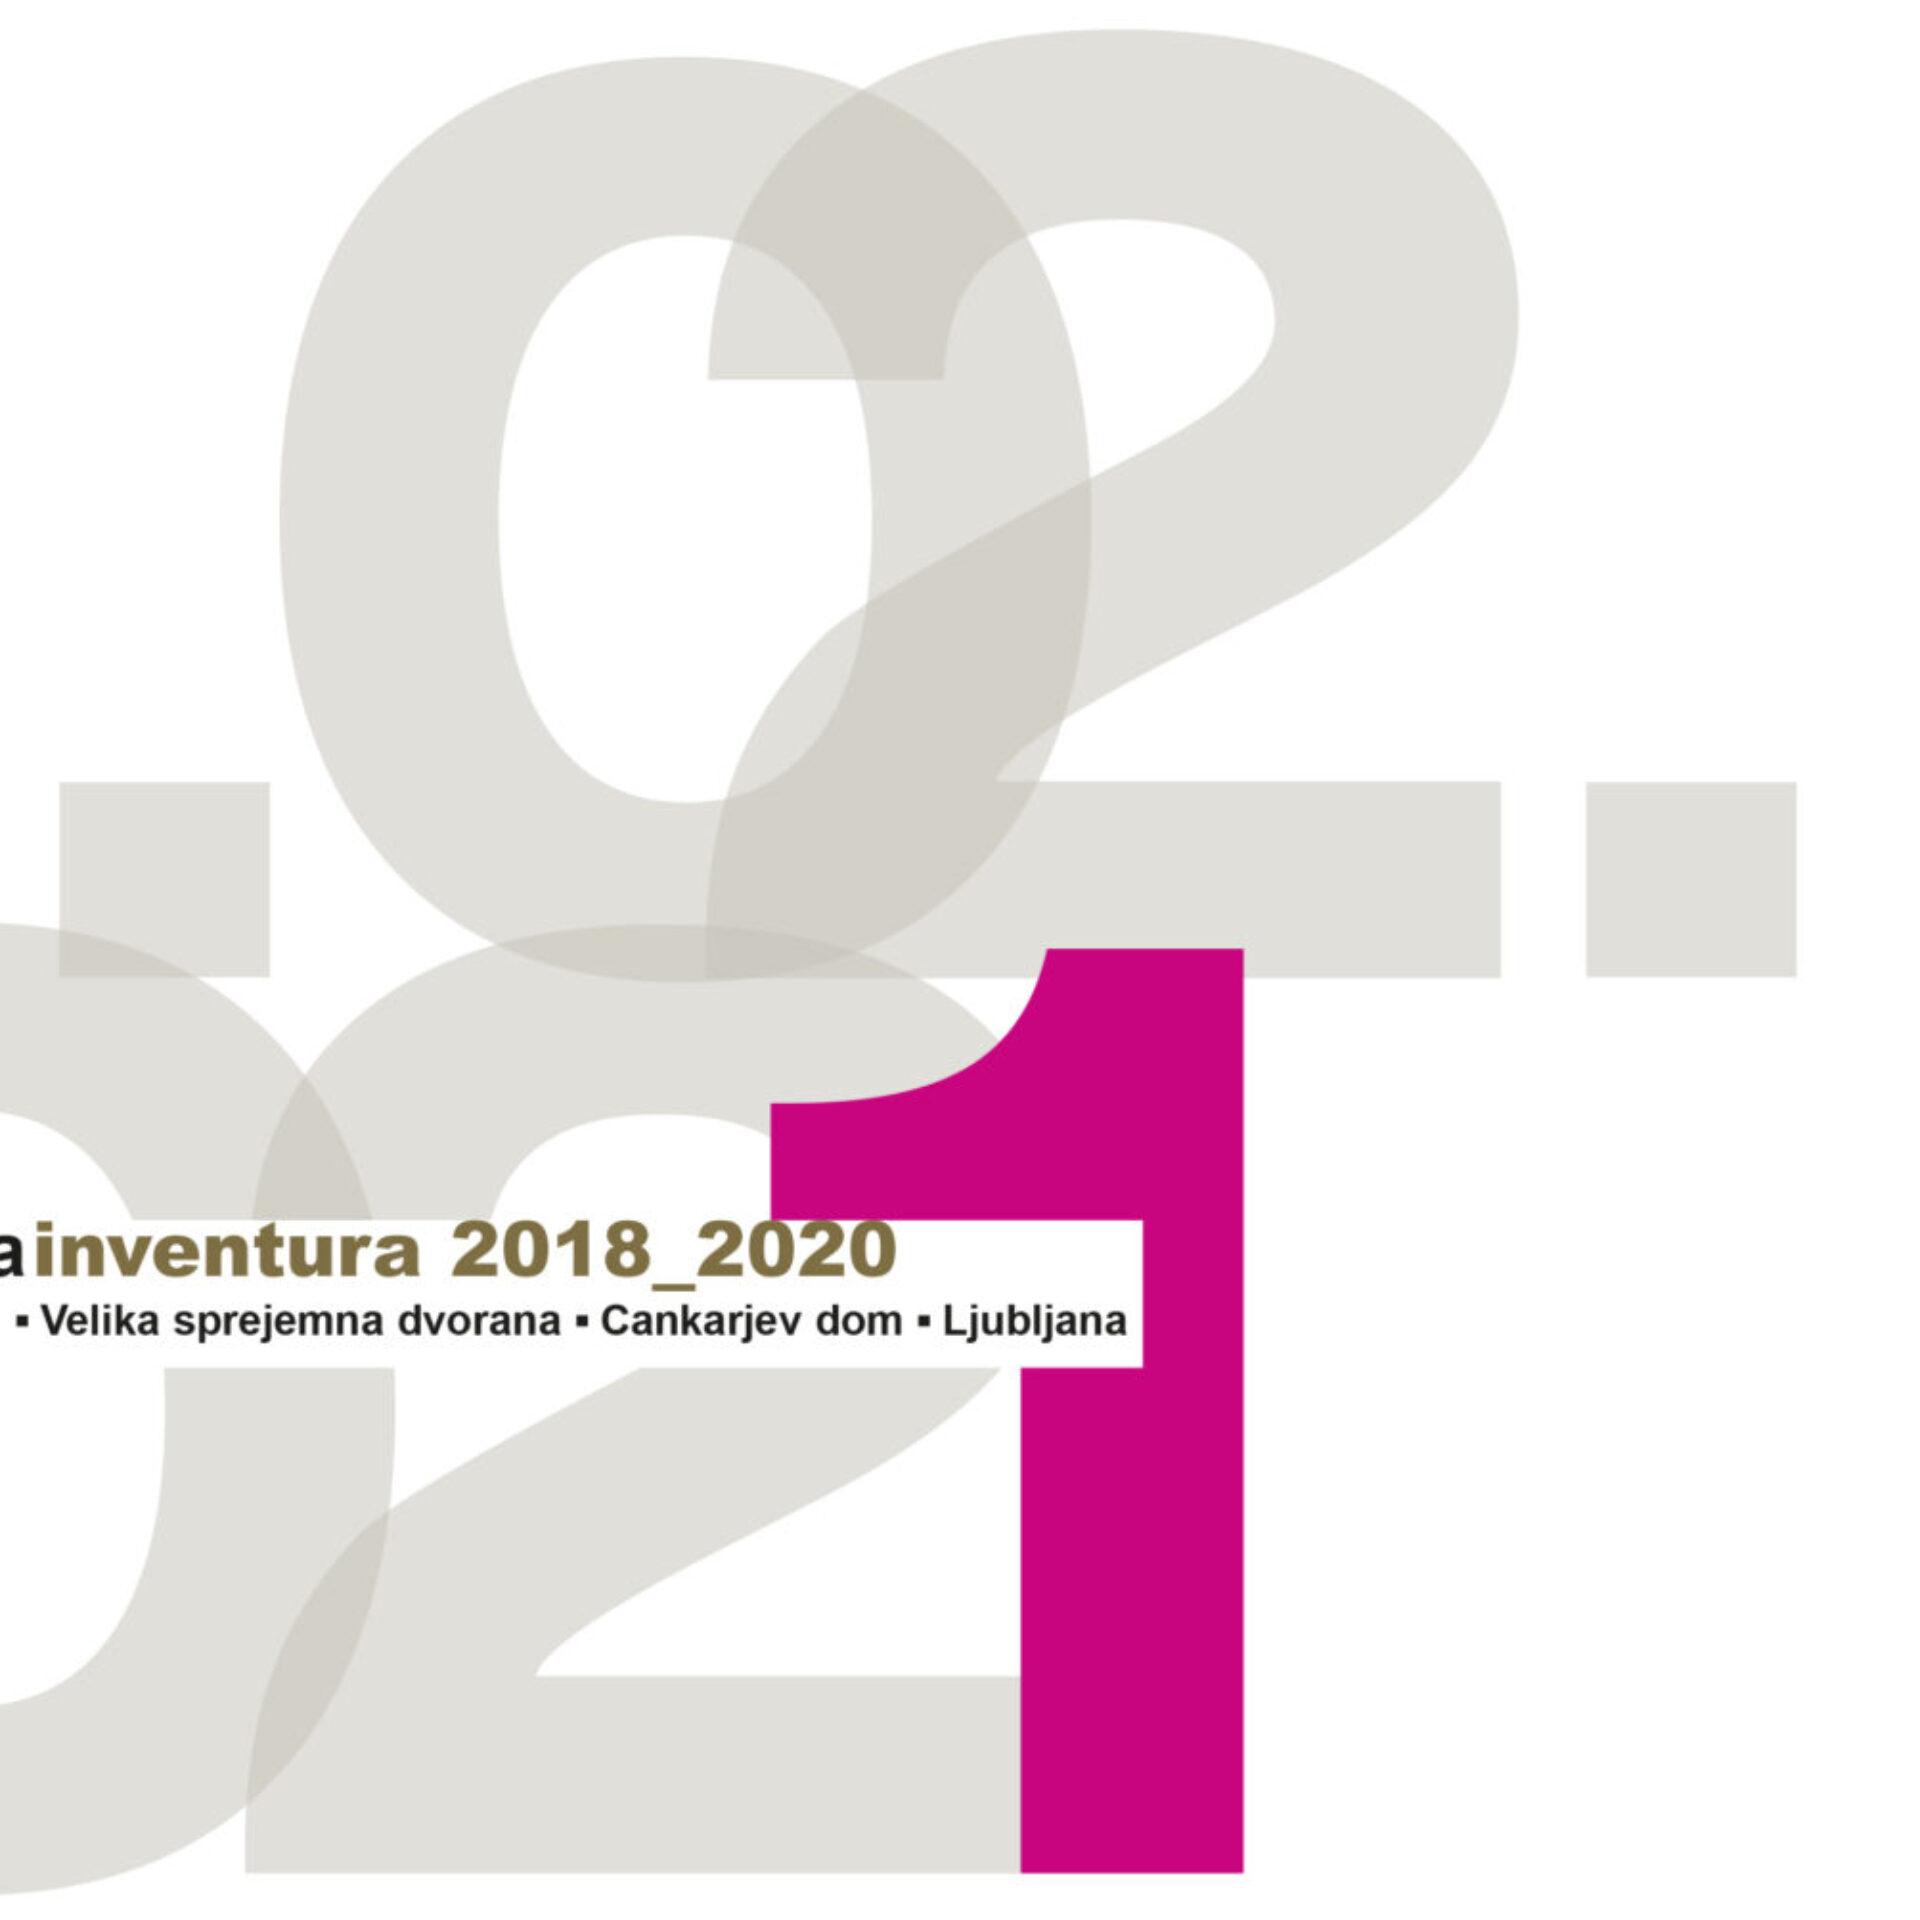 ARHITEKTURA INVENTURA 2018-2020